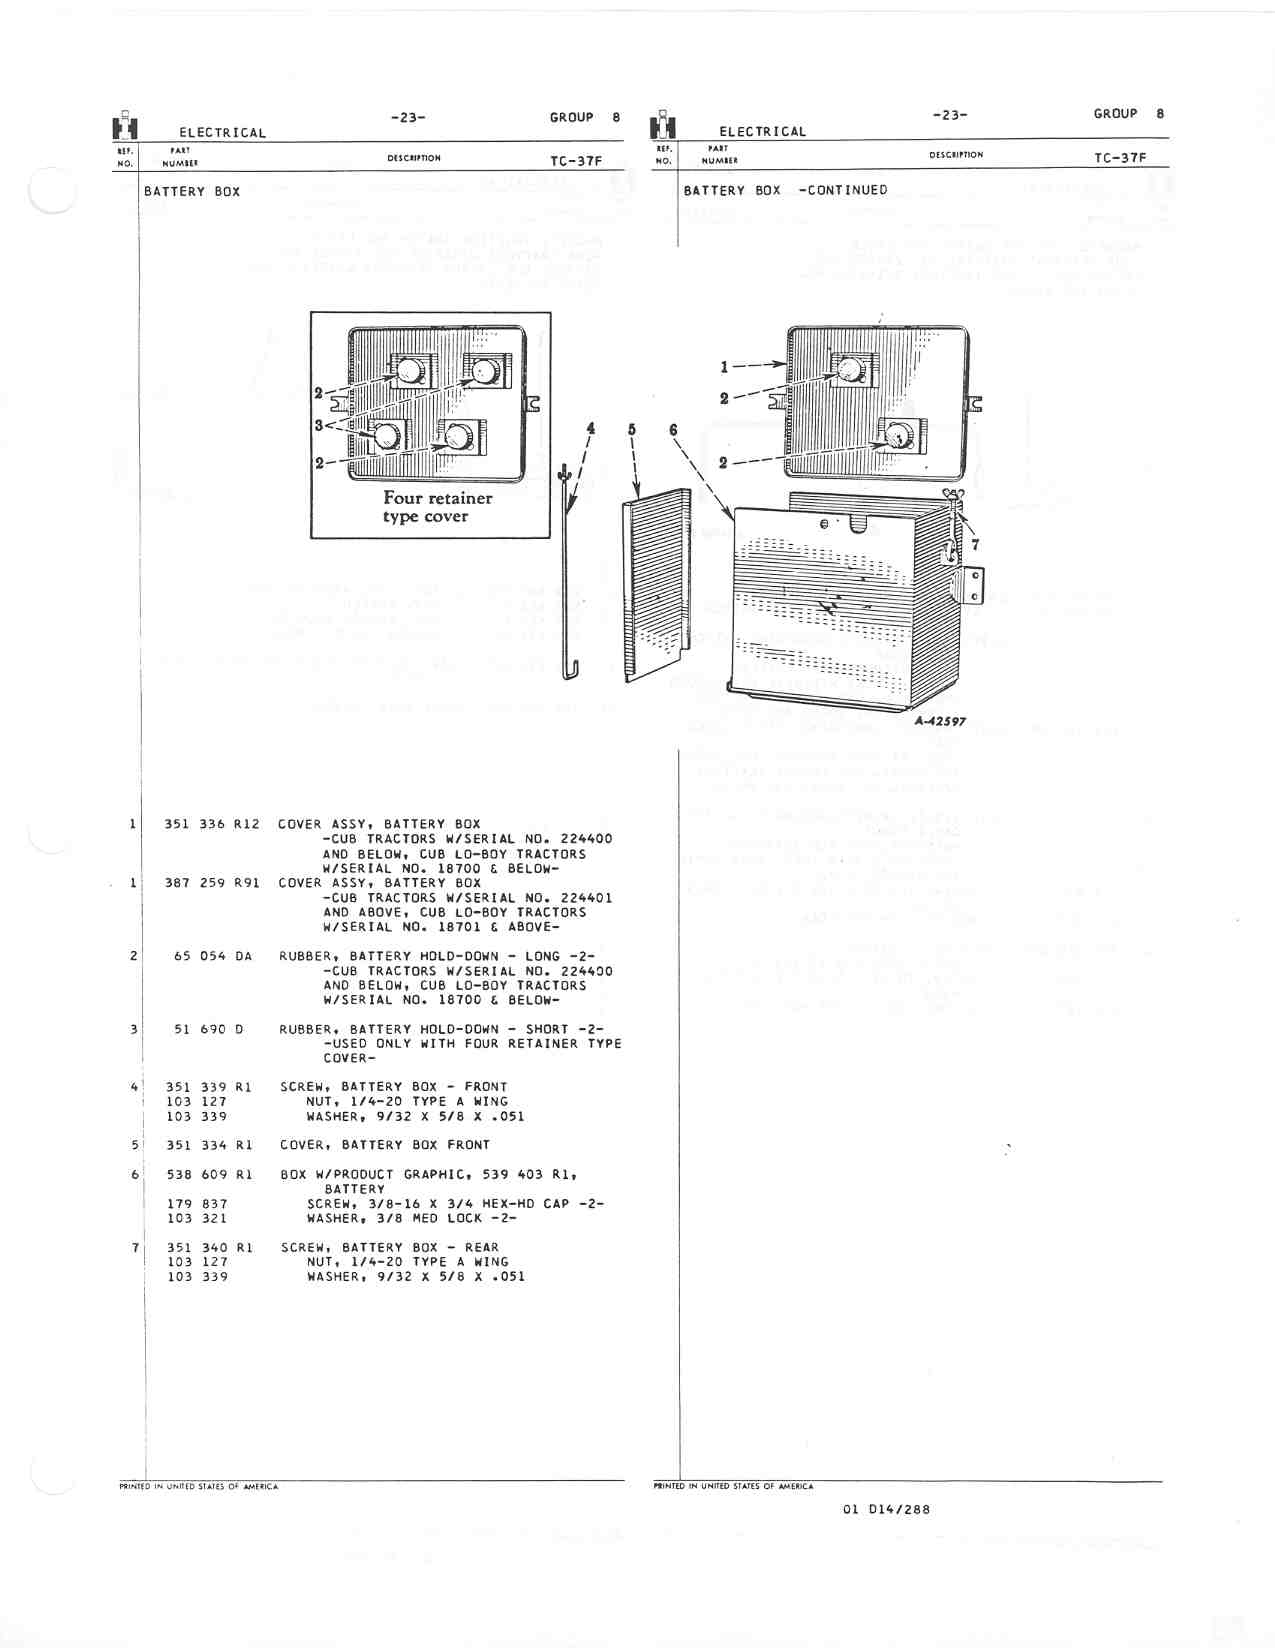 Lovely 1950 Farmall Cub Wiring Diagram Photos - Electrical System ...